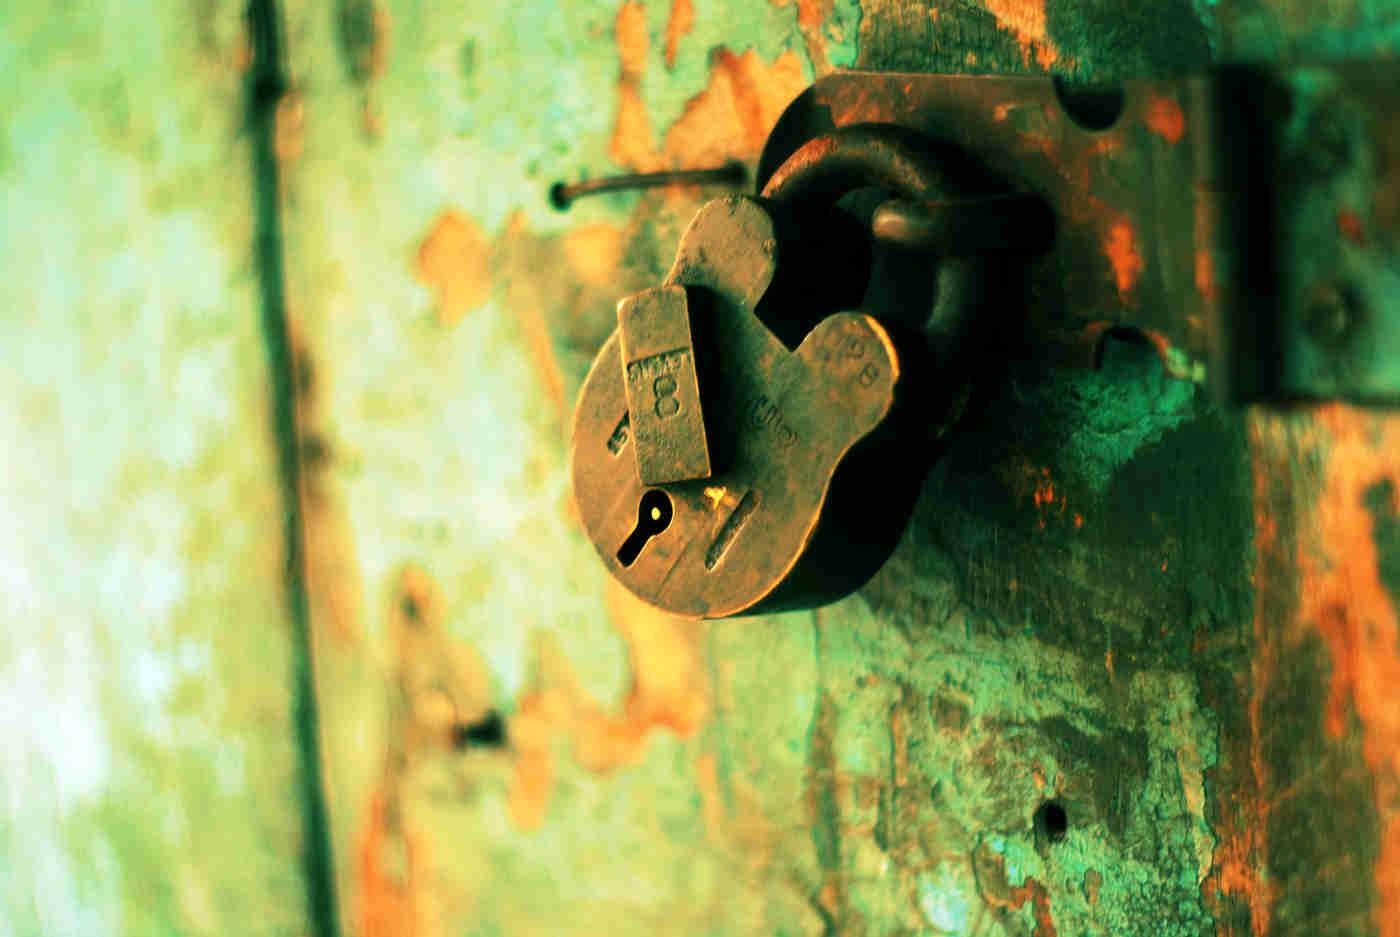 8-lever padlock